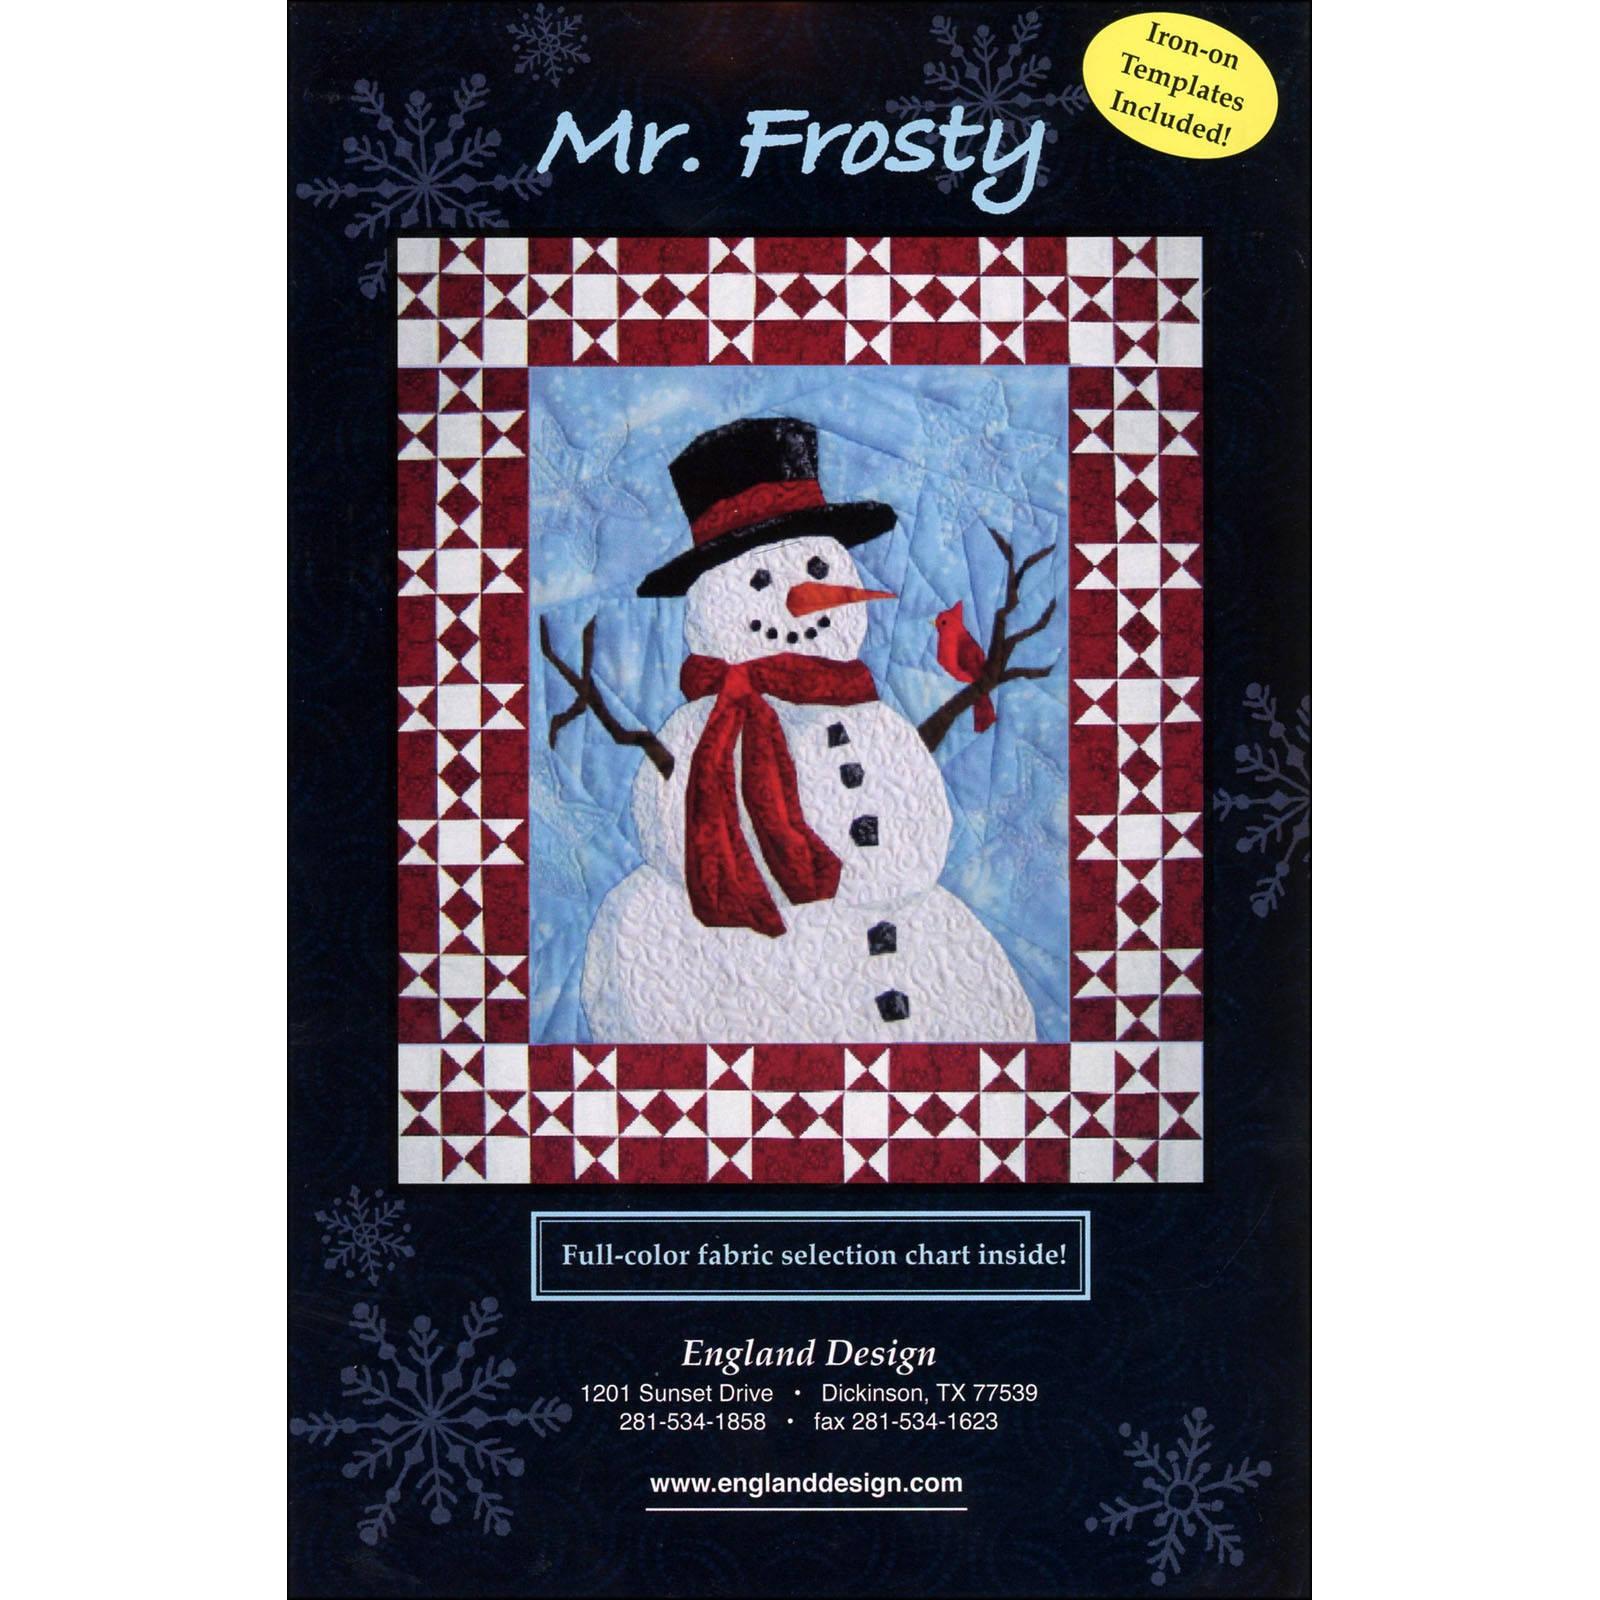 Mr. Frosty Snowman Quilt Pattern